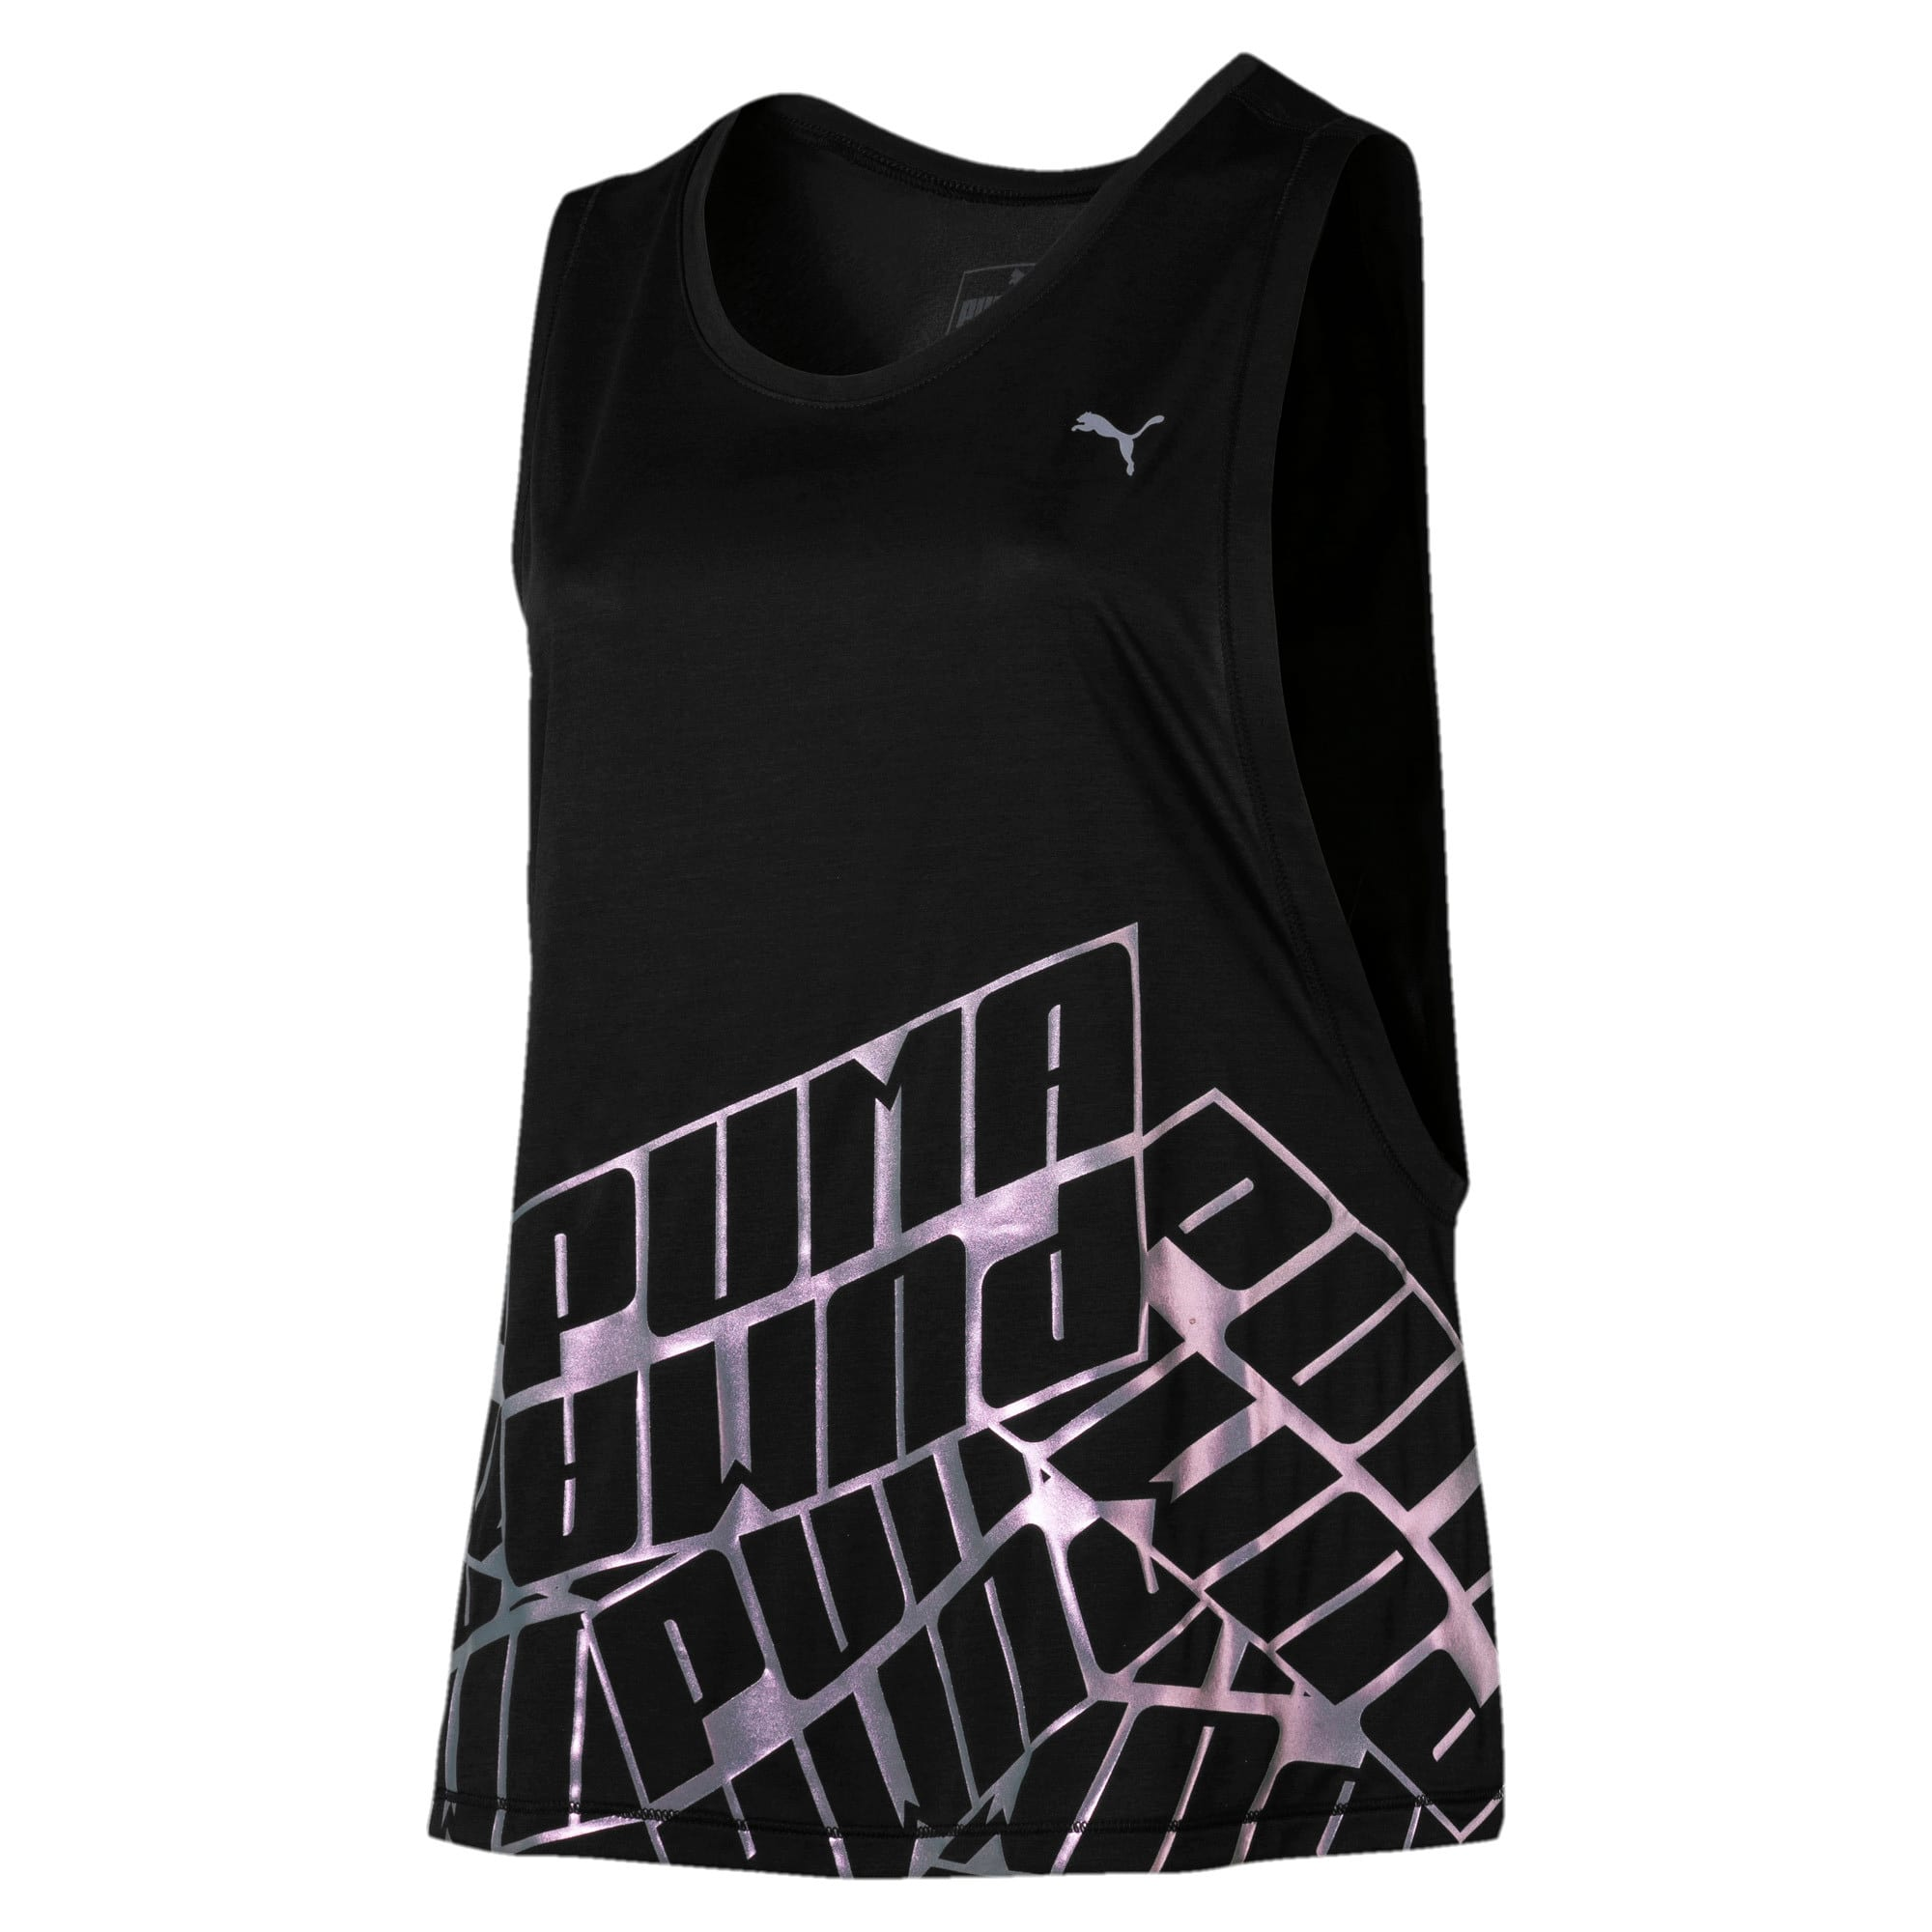 Miniatura 4 de Camiseta sin mangas Aire de mujer, Puma Black Heather, mediano